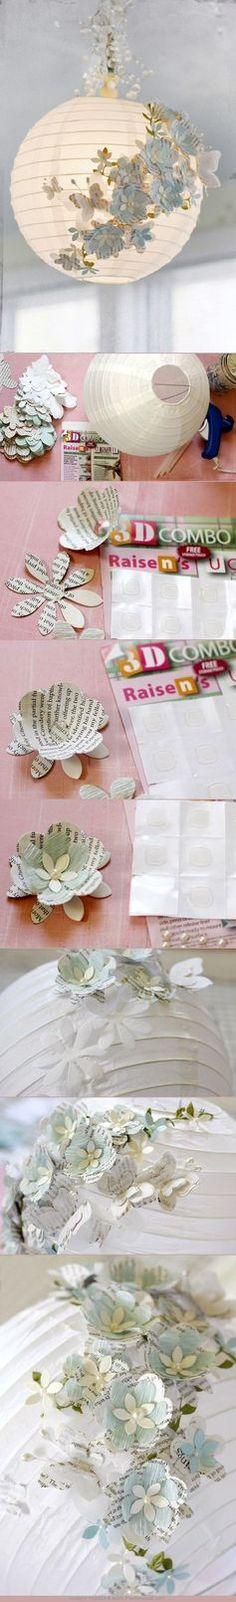 3D paper lanterns DIY